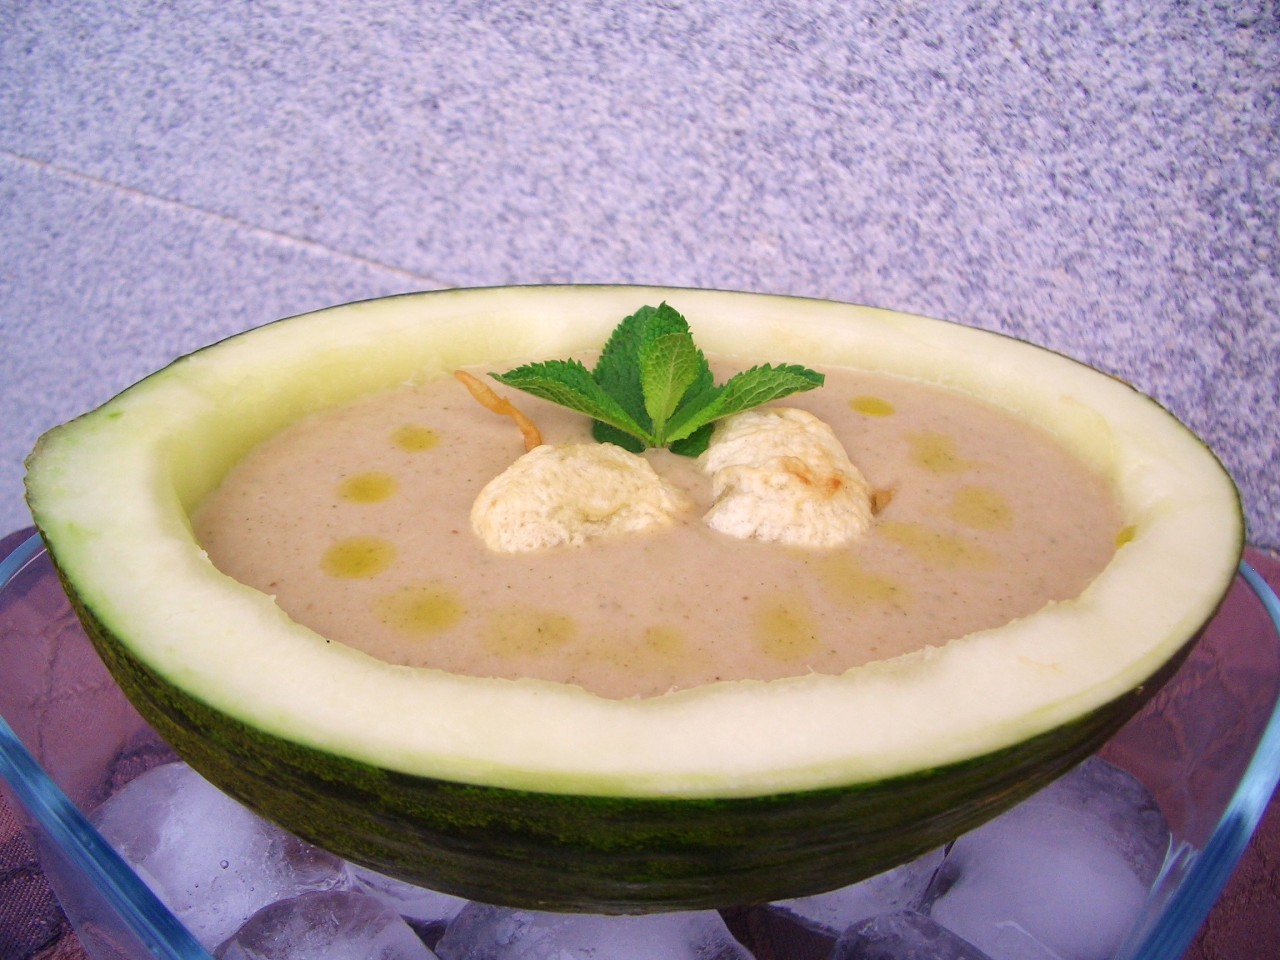 Sopa de Melón, Menta y Boletus – Melon, Mint and MushroomSoup